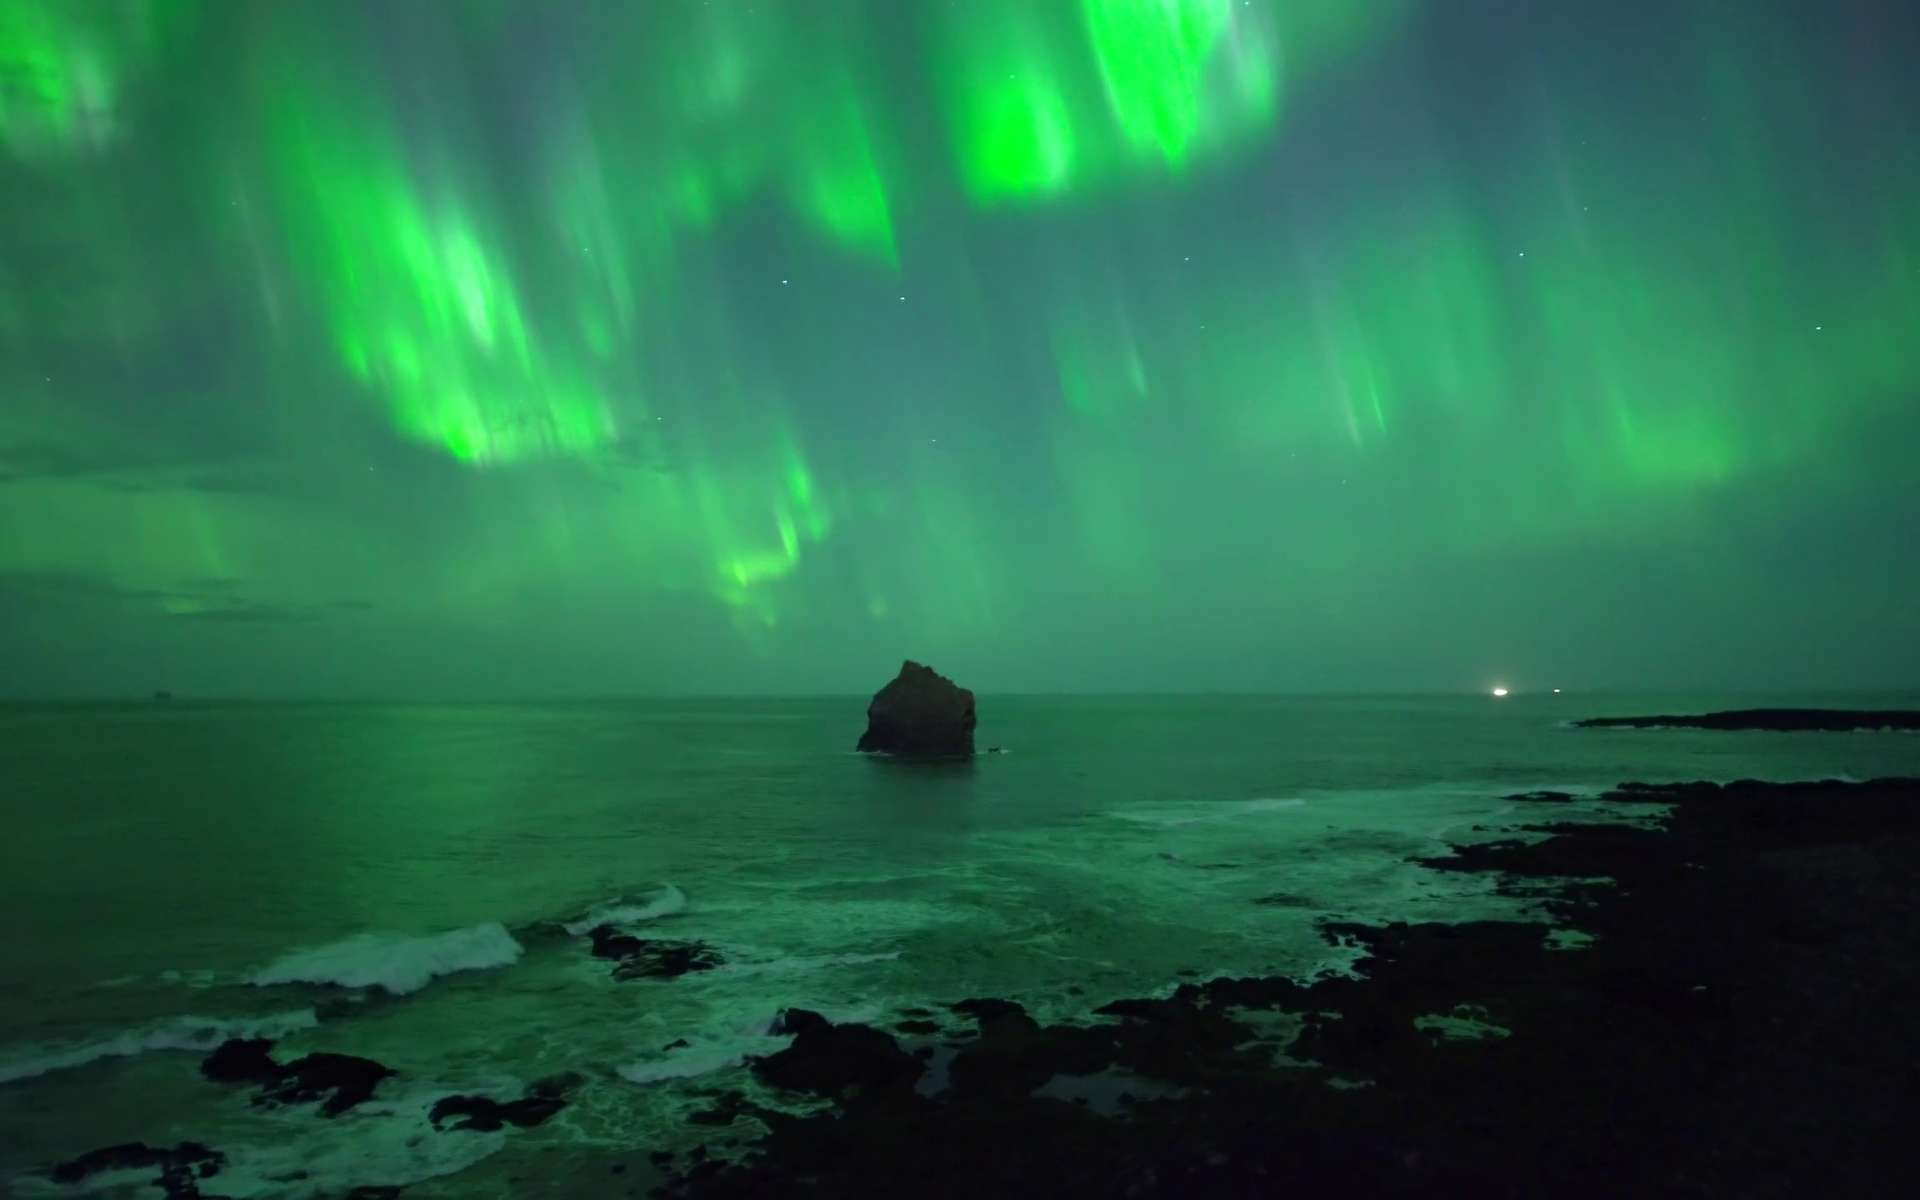 Impresionante aurora boreal filmada por un dron